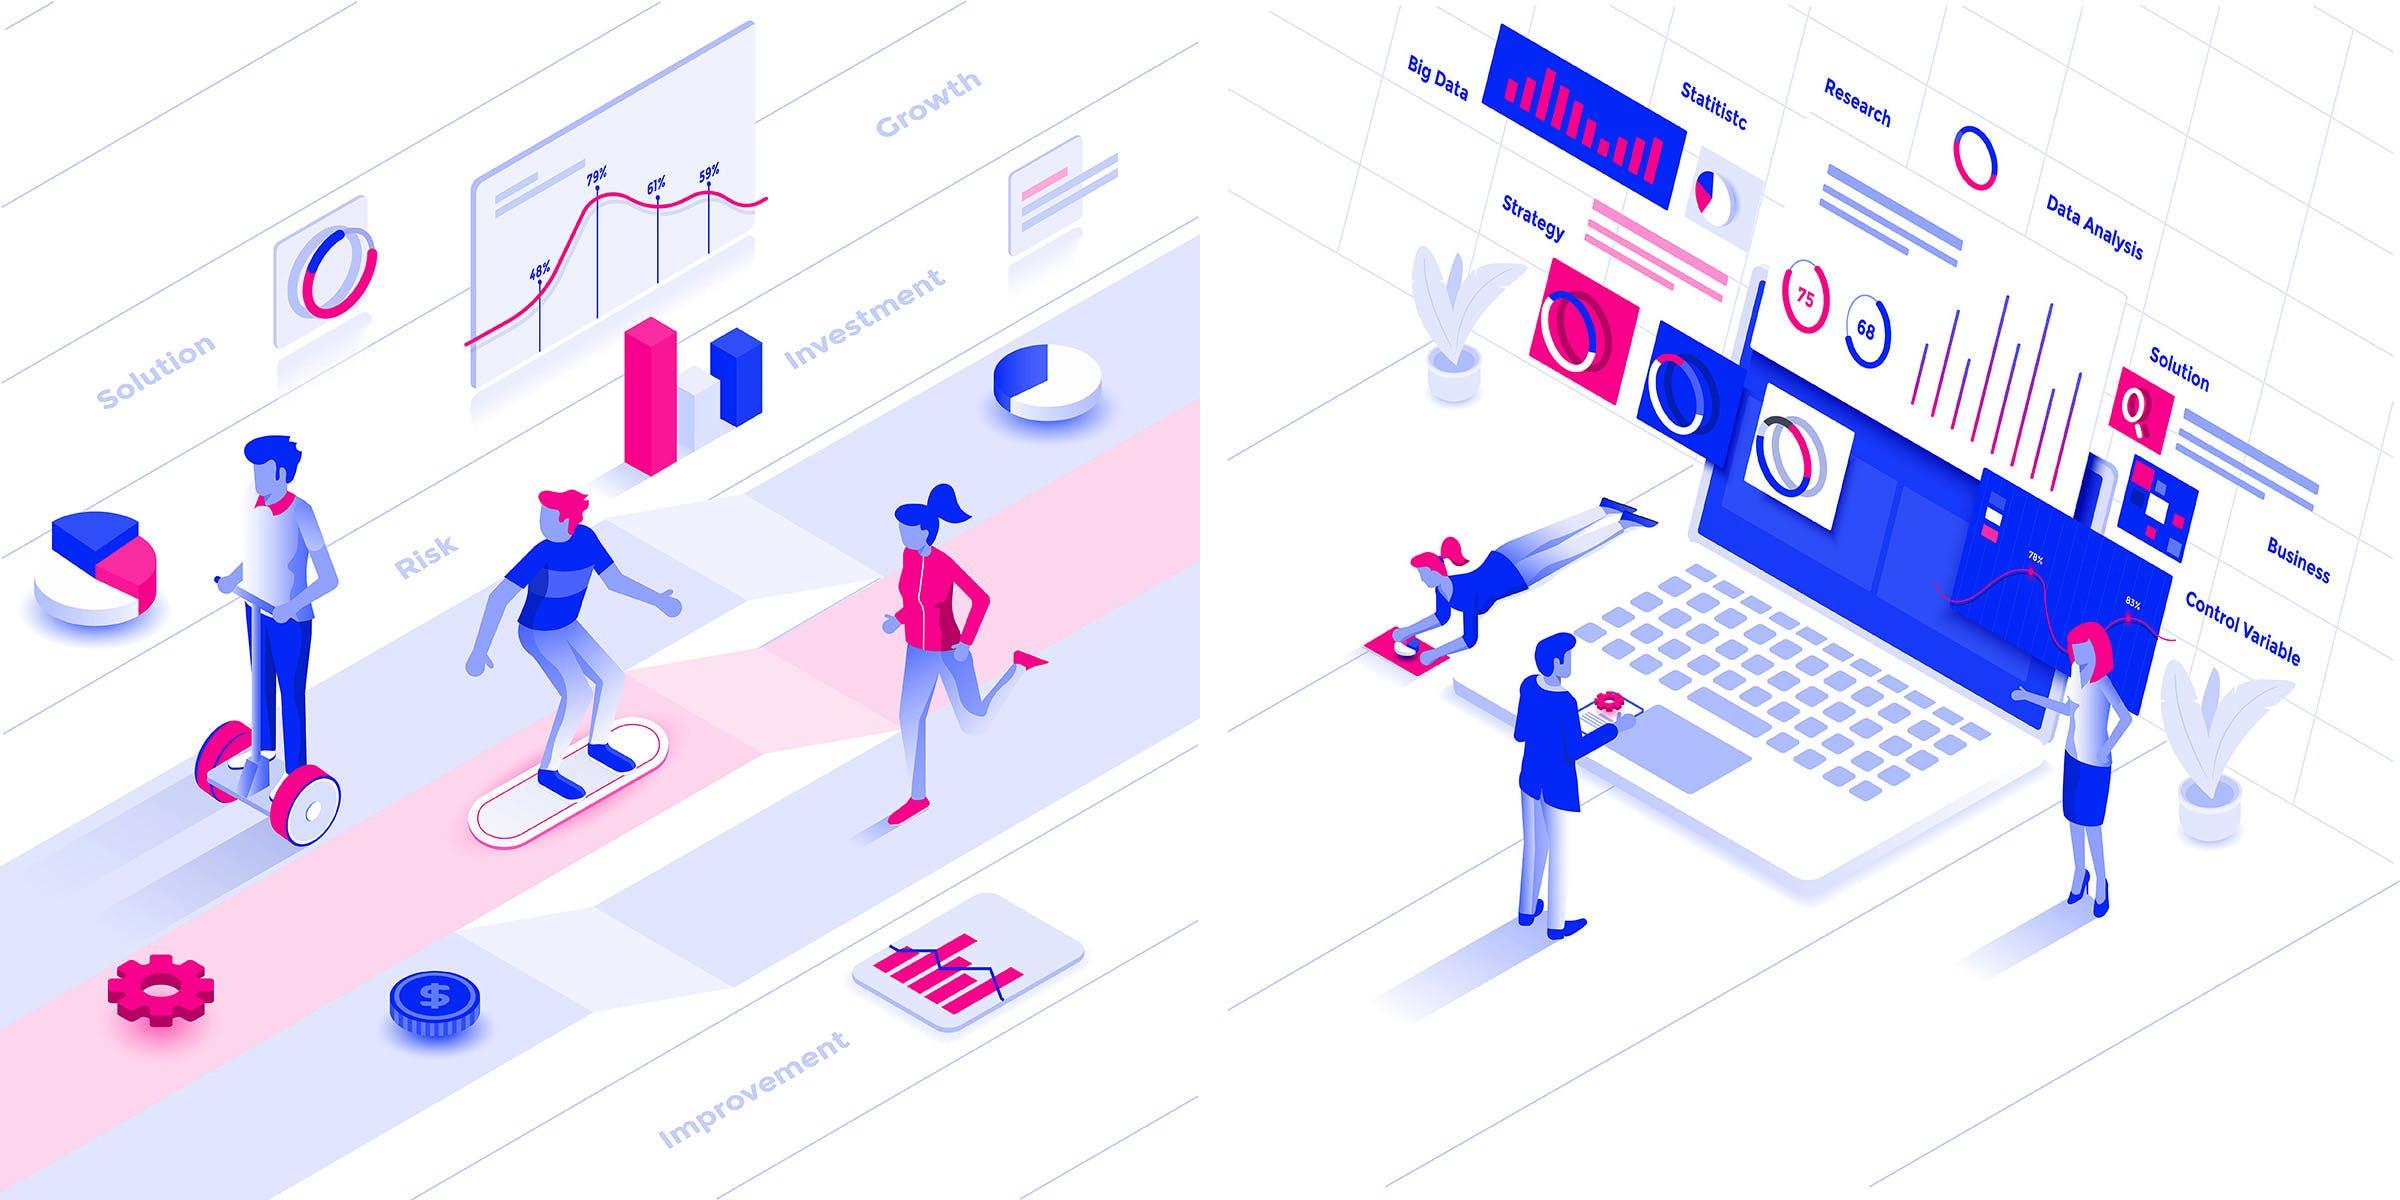 2.5D工作汇报场景插画设计业务分析下载Modern flat design isometric illustration kit